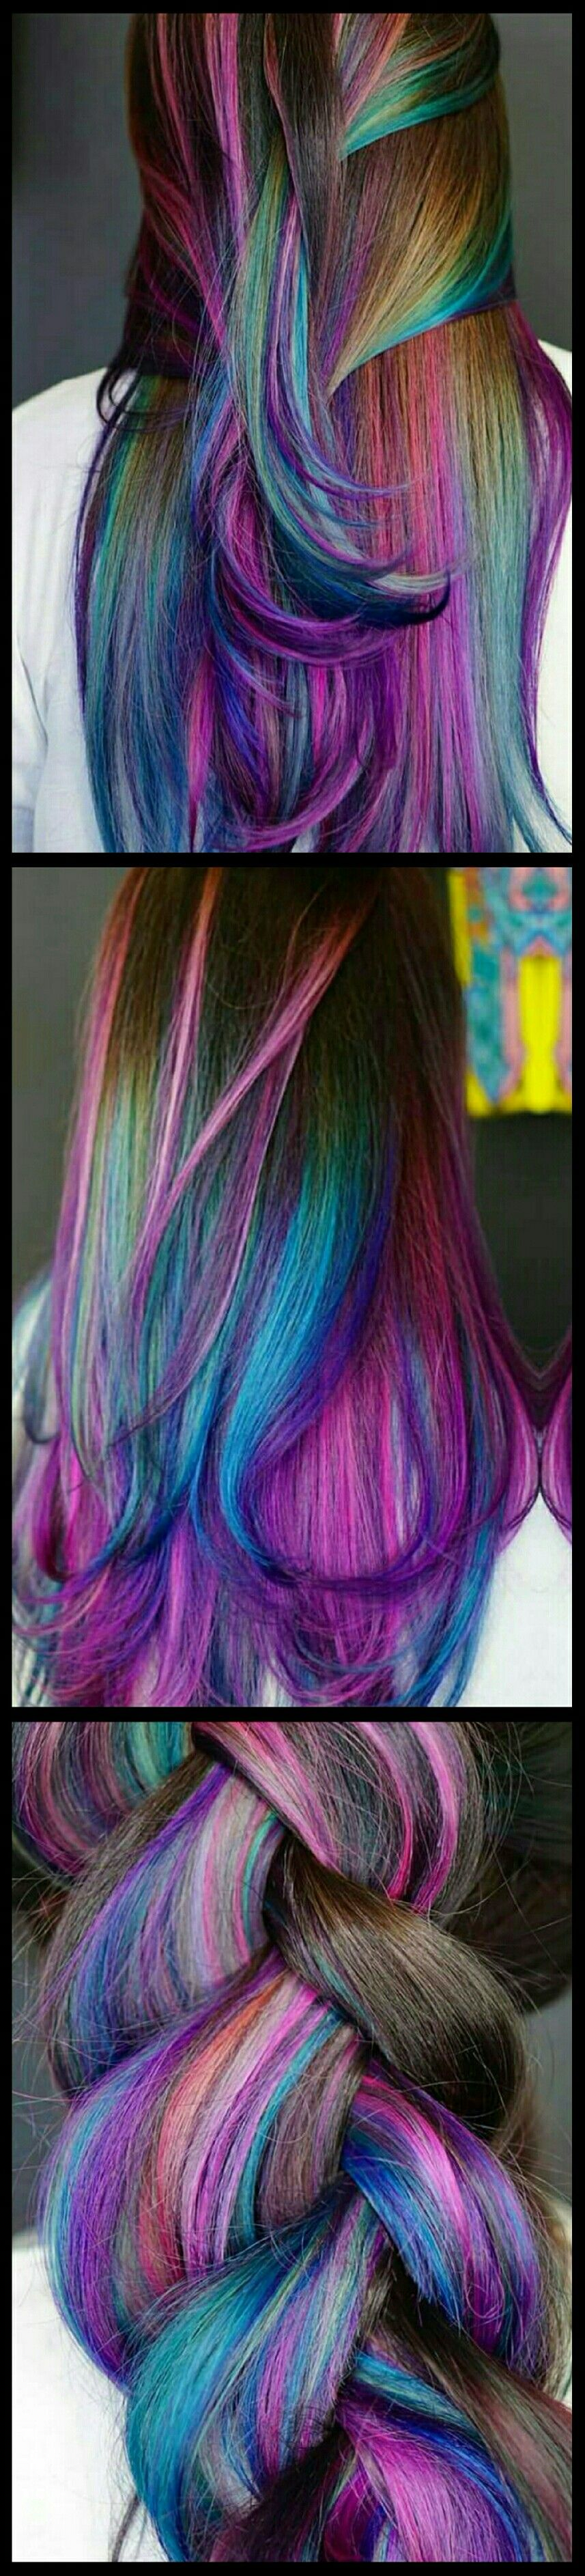 Totosingman Pelo Multicolor Hairstyles Pinterest Hair Hair